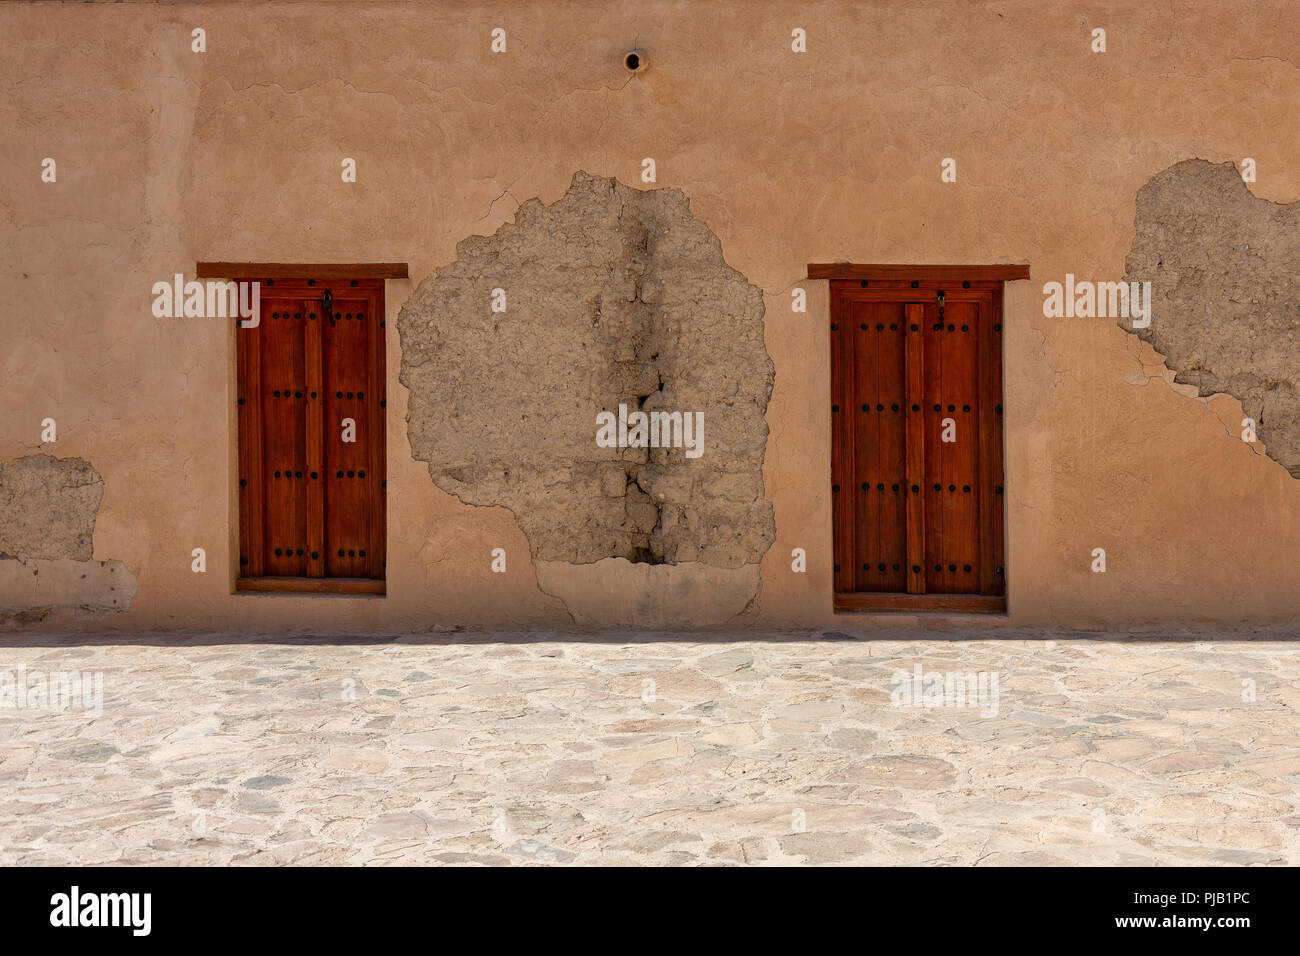 Nizwa, Nizwa Fort, Sultanate of Oman. - Stock Image